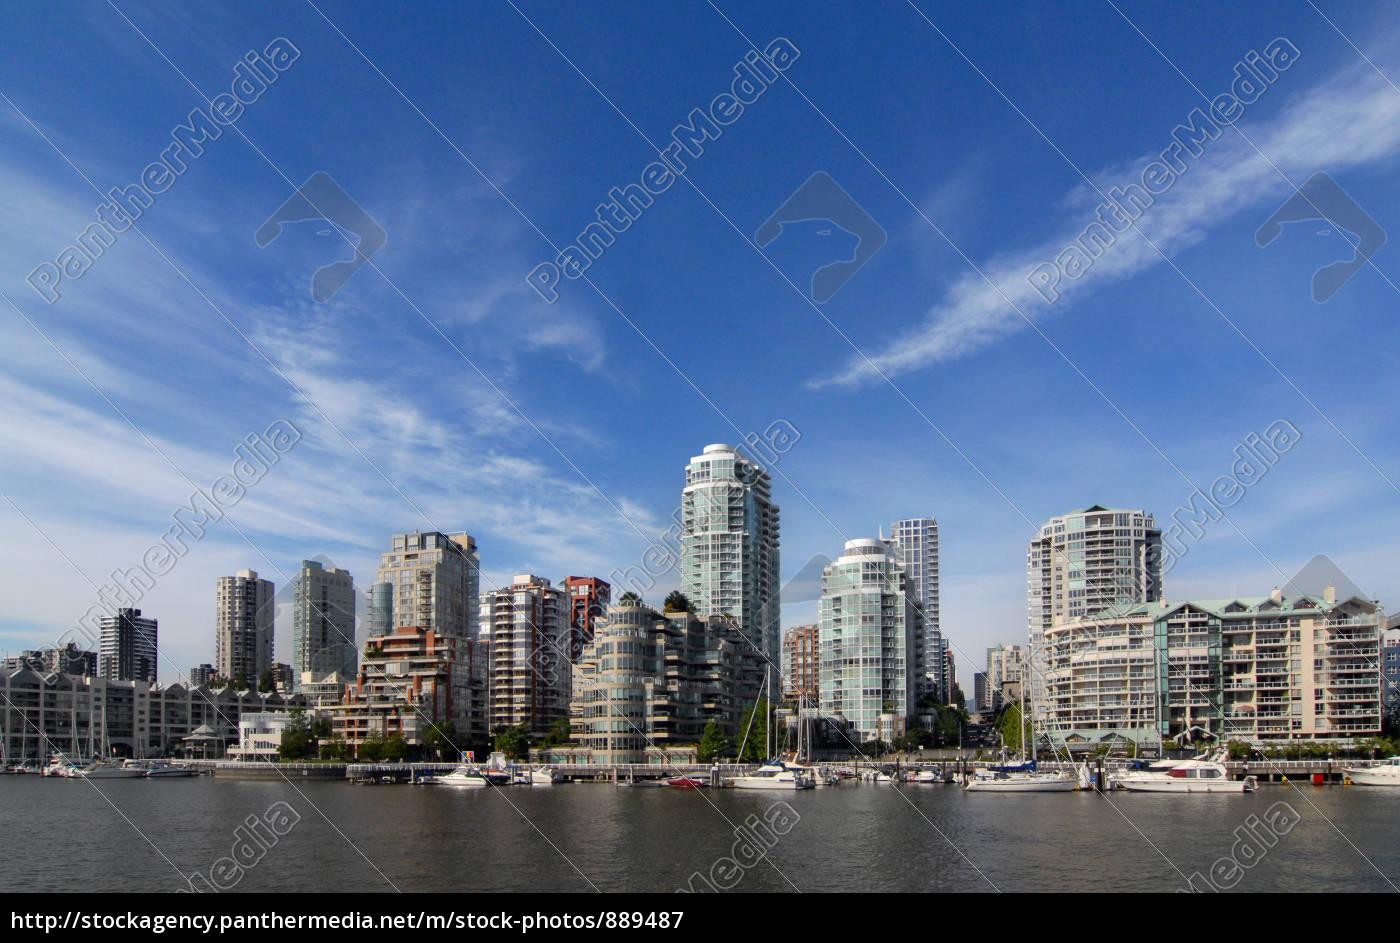 vancouver - 889487